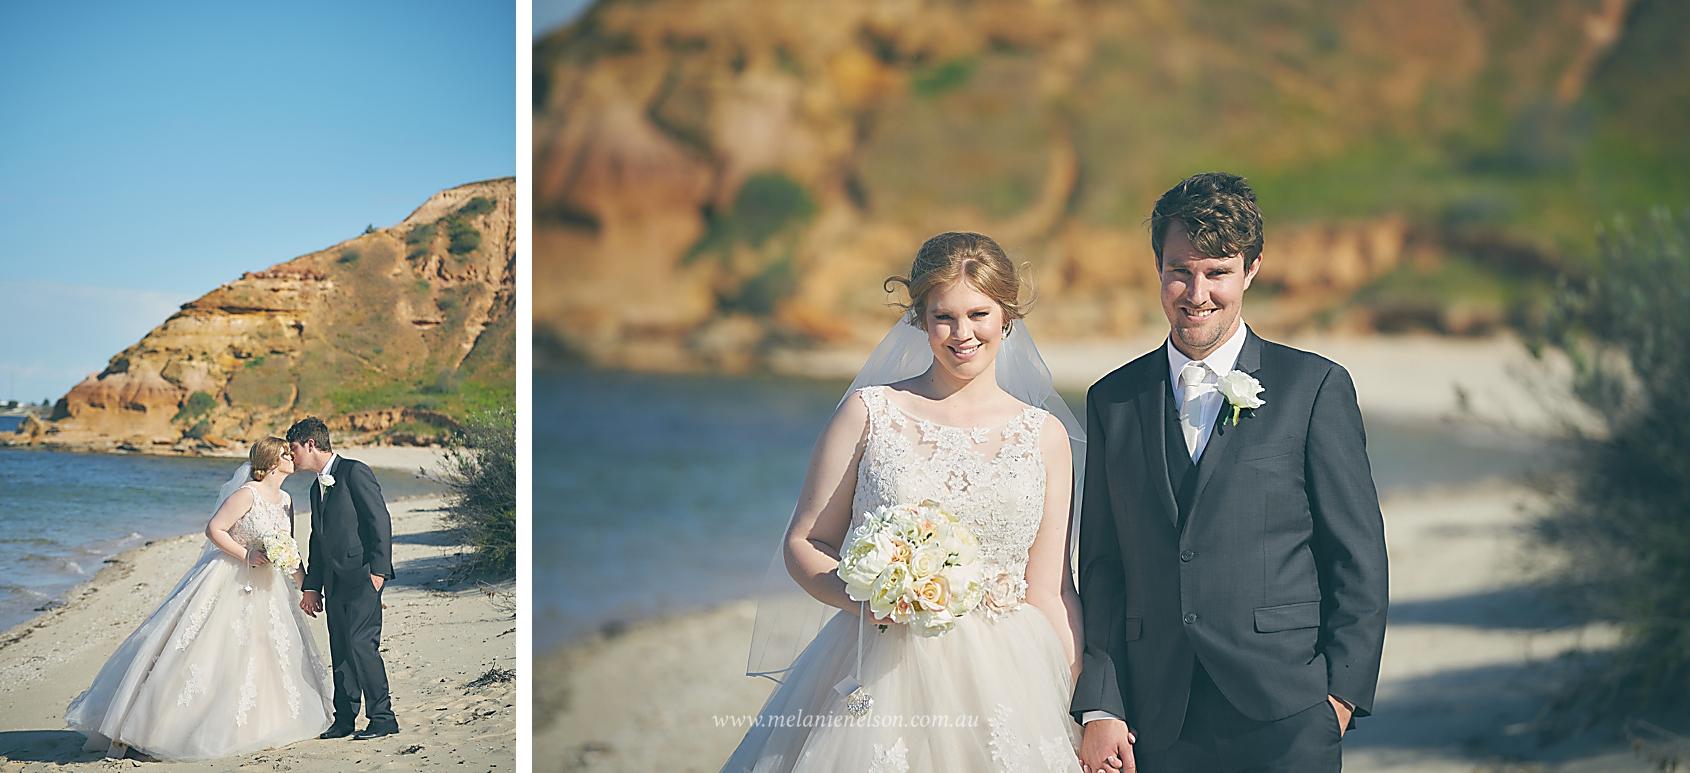 yorke_peninsula_wedding_photographer_0051.jpg